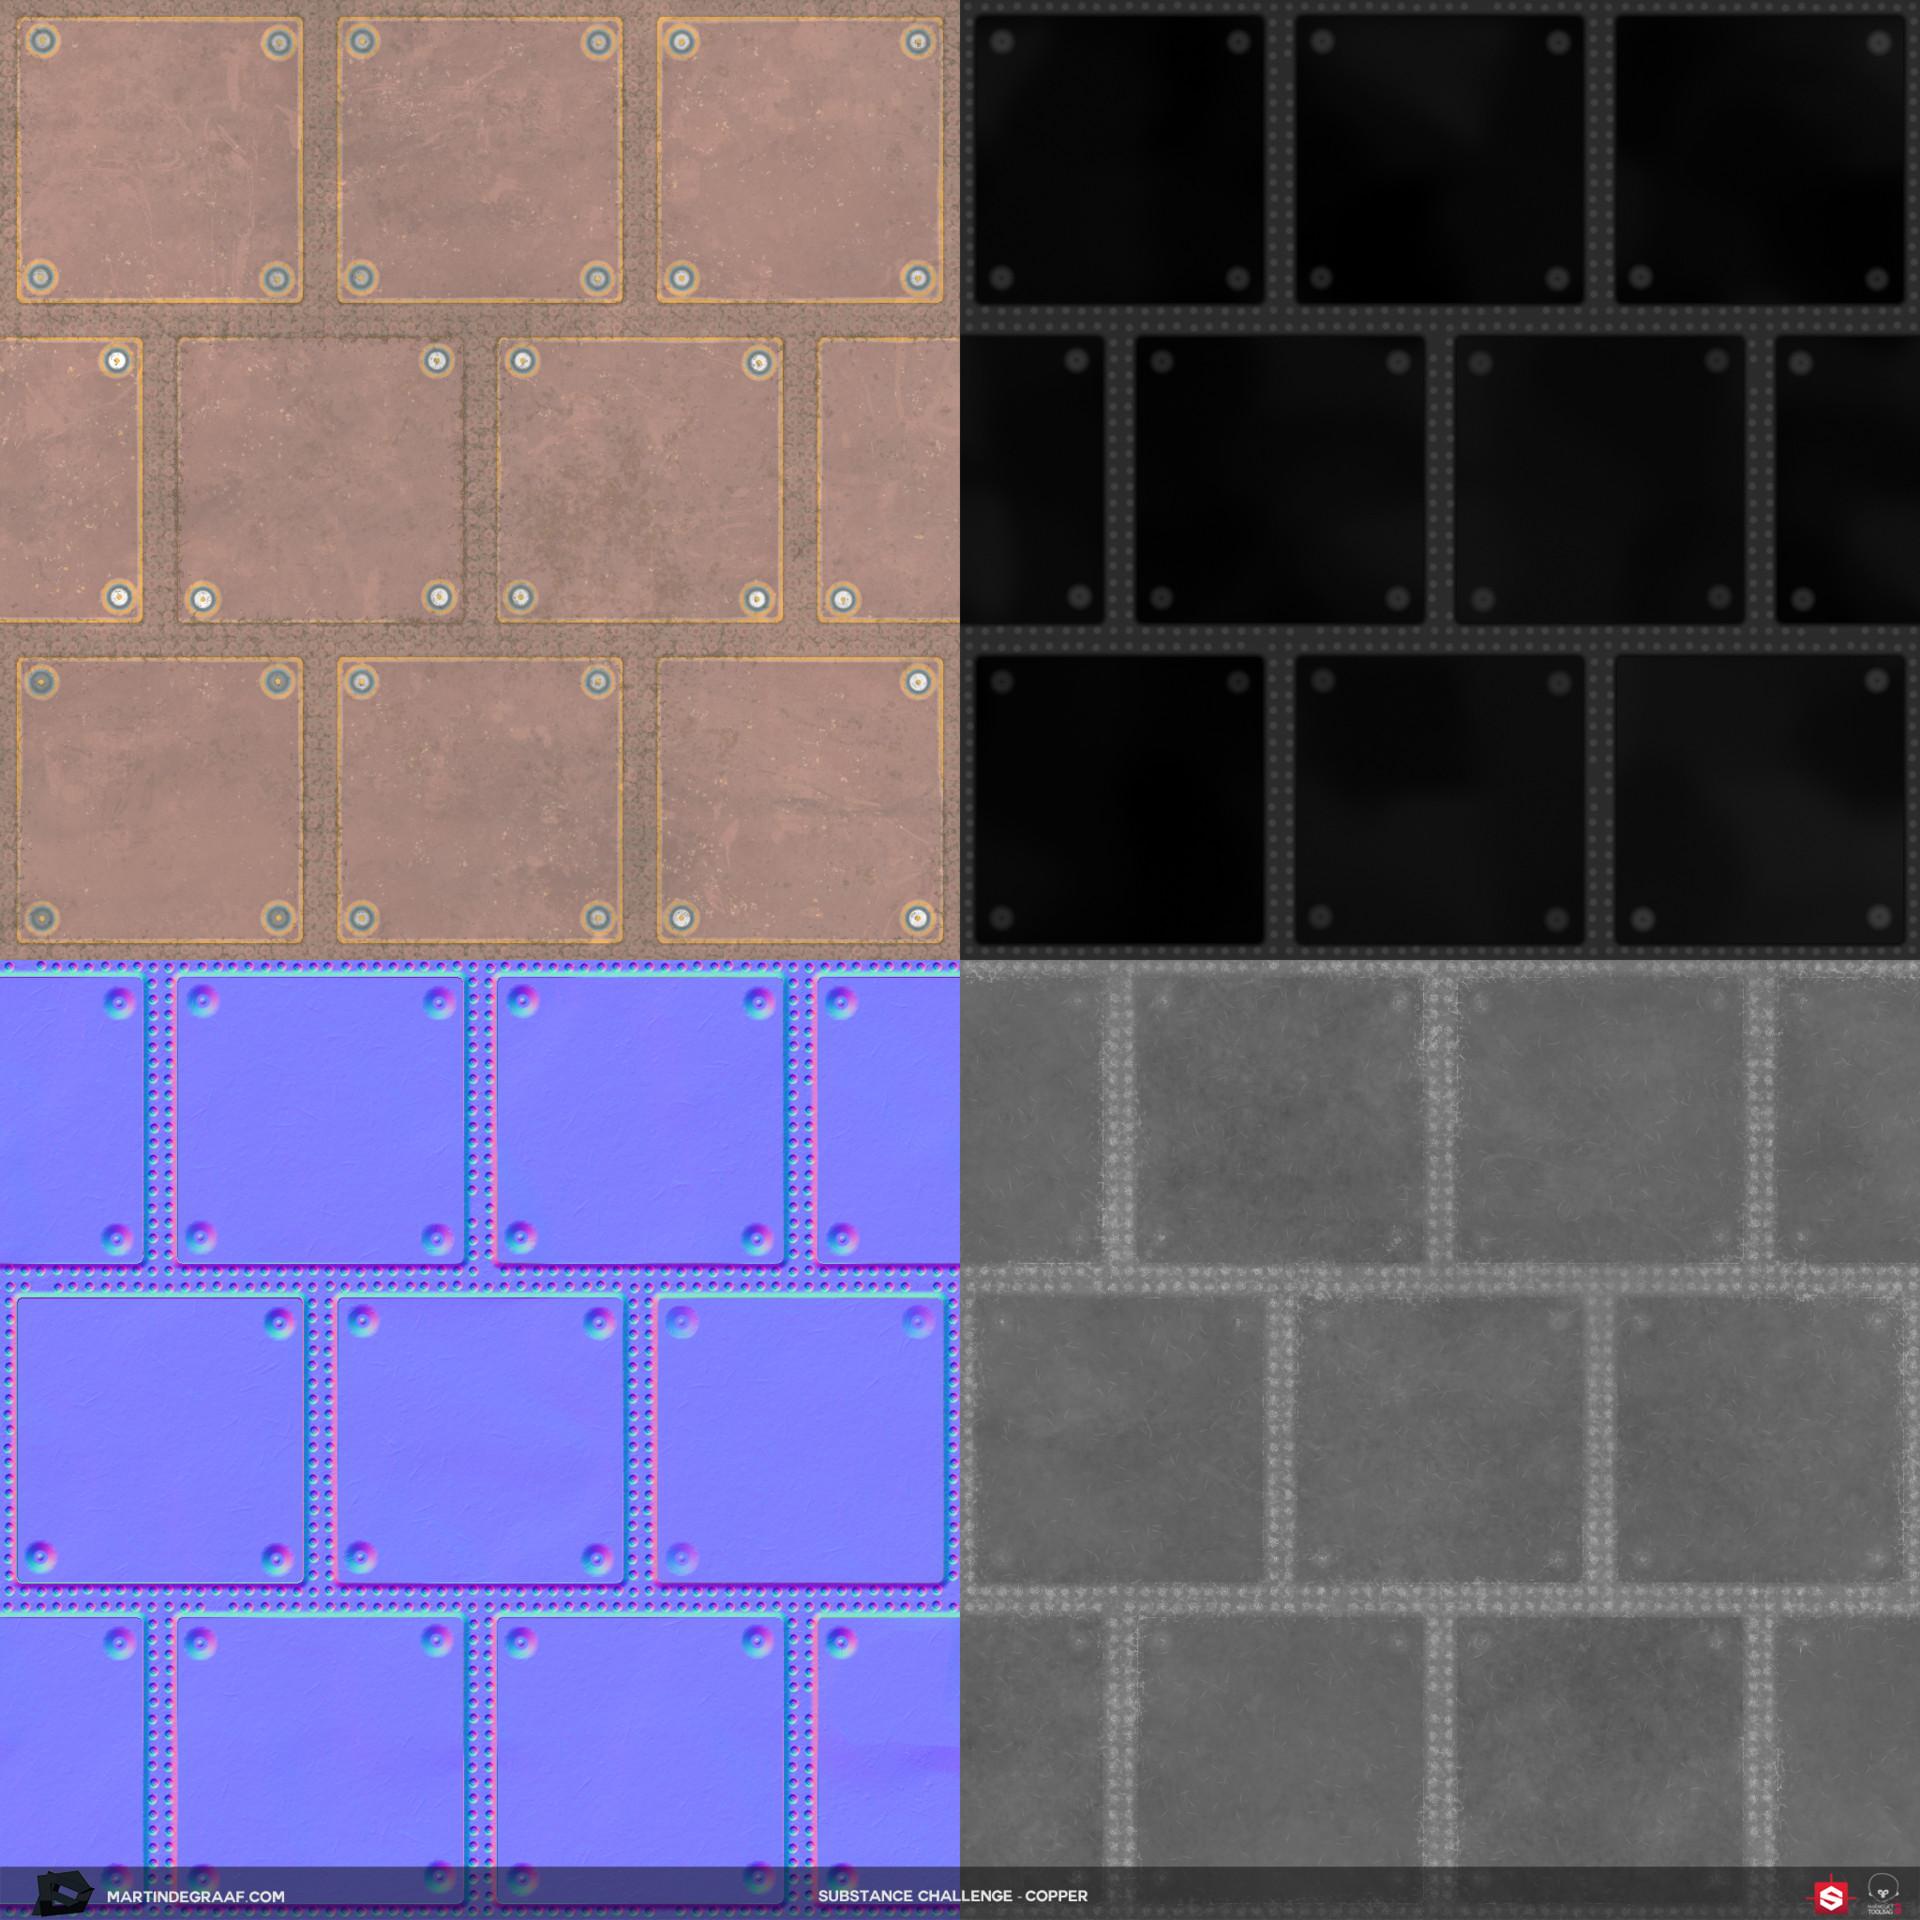 Martin de graaf substance challenge copper substance texturesheet martin de graaf 2017